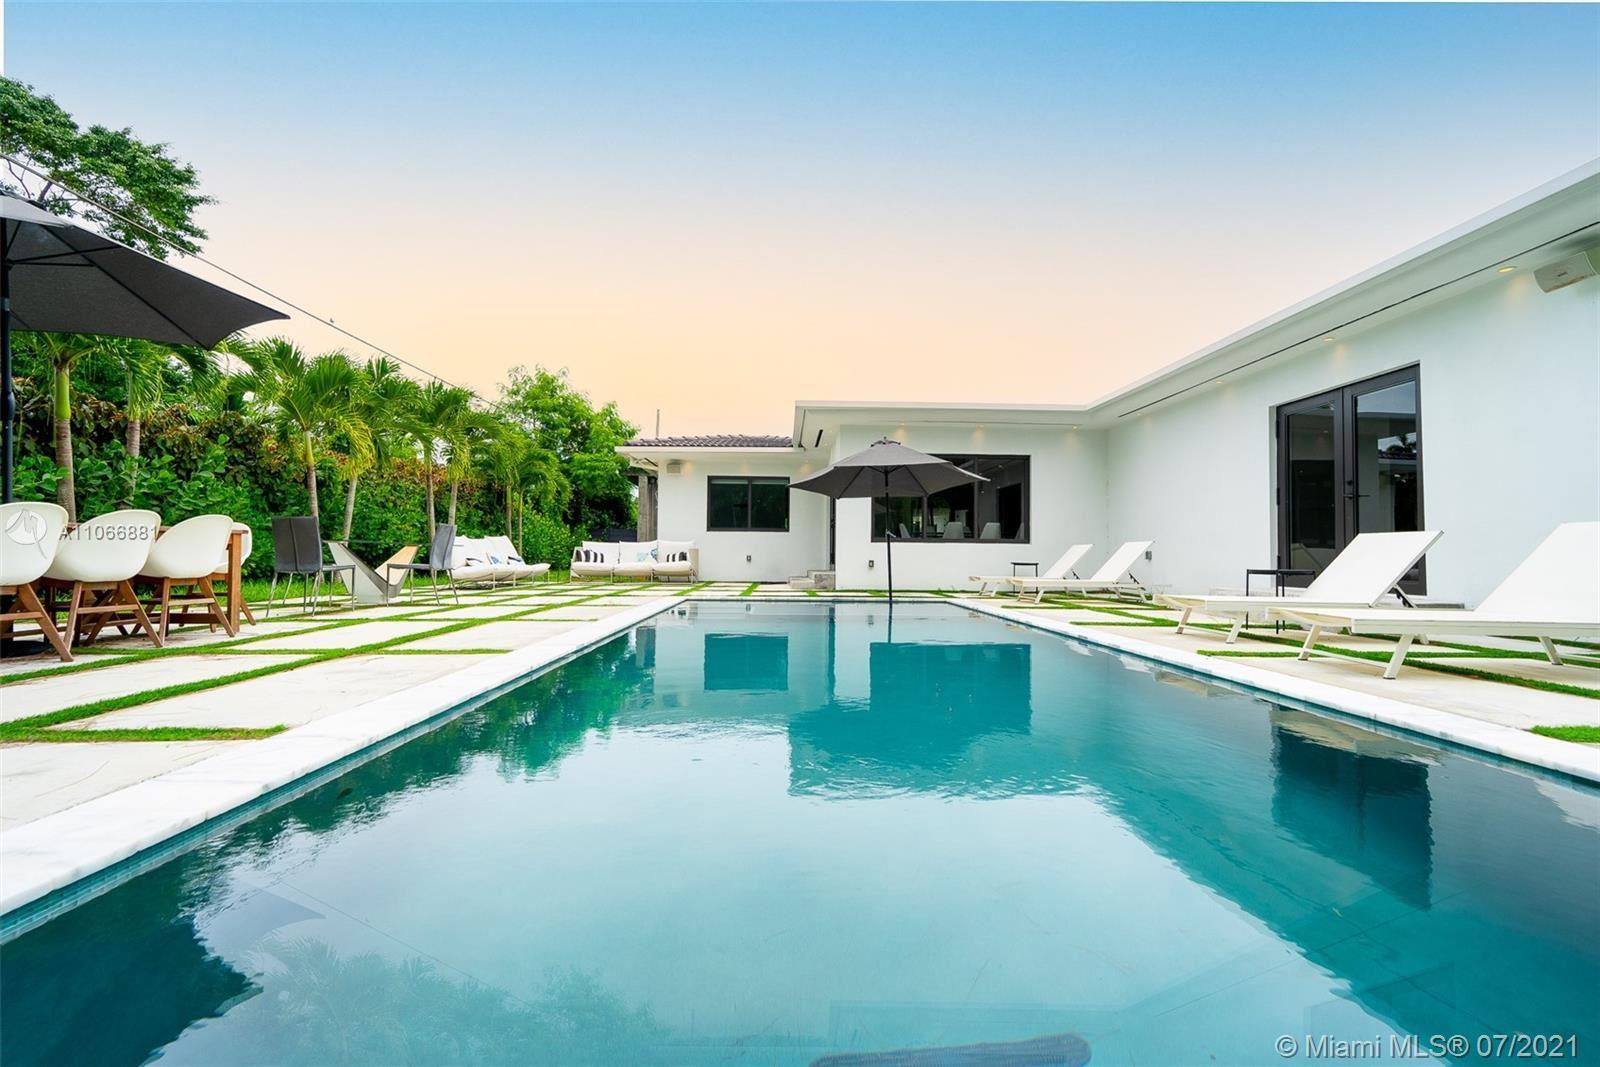 Photo of 525 W 37th St, Miami Beach, FL 33140 (MLS # A11066881)